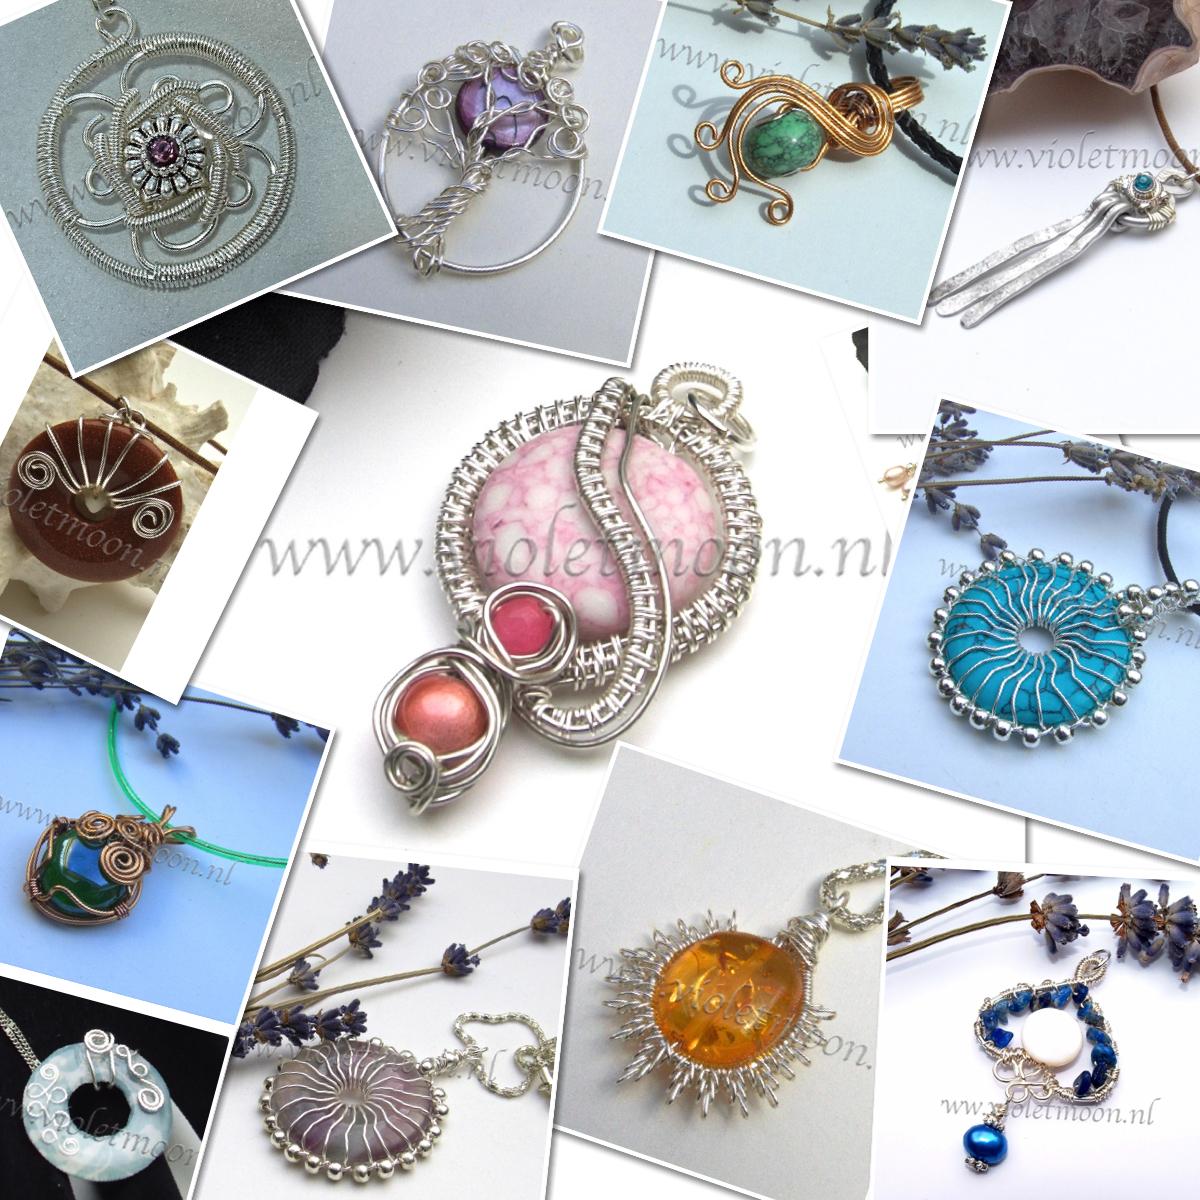 wire sieraden van Violetmoon.nl